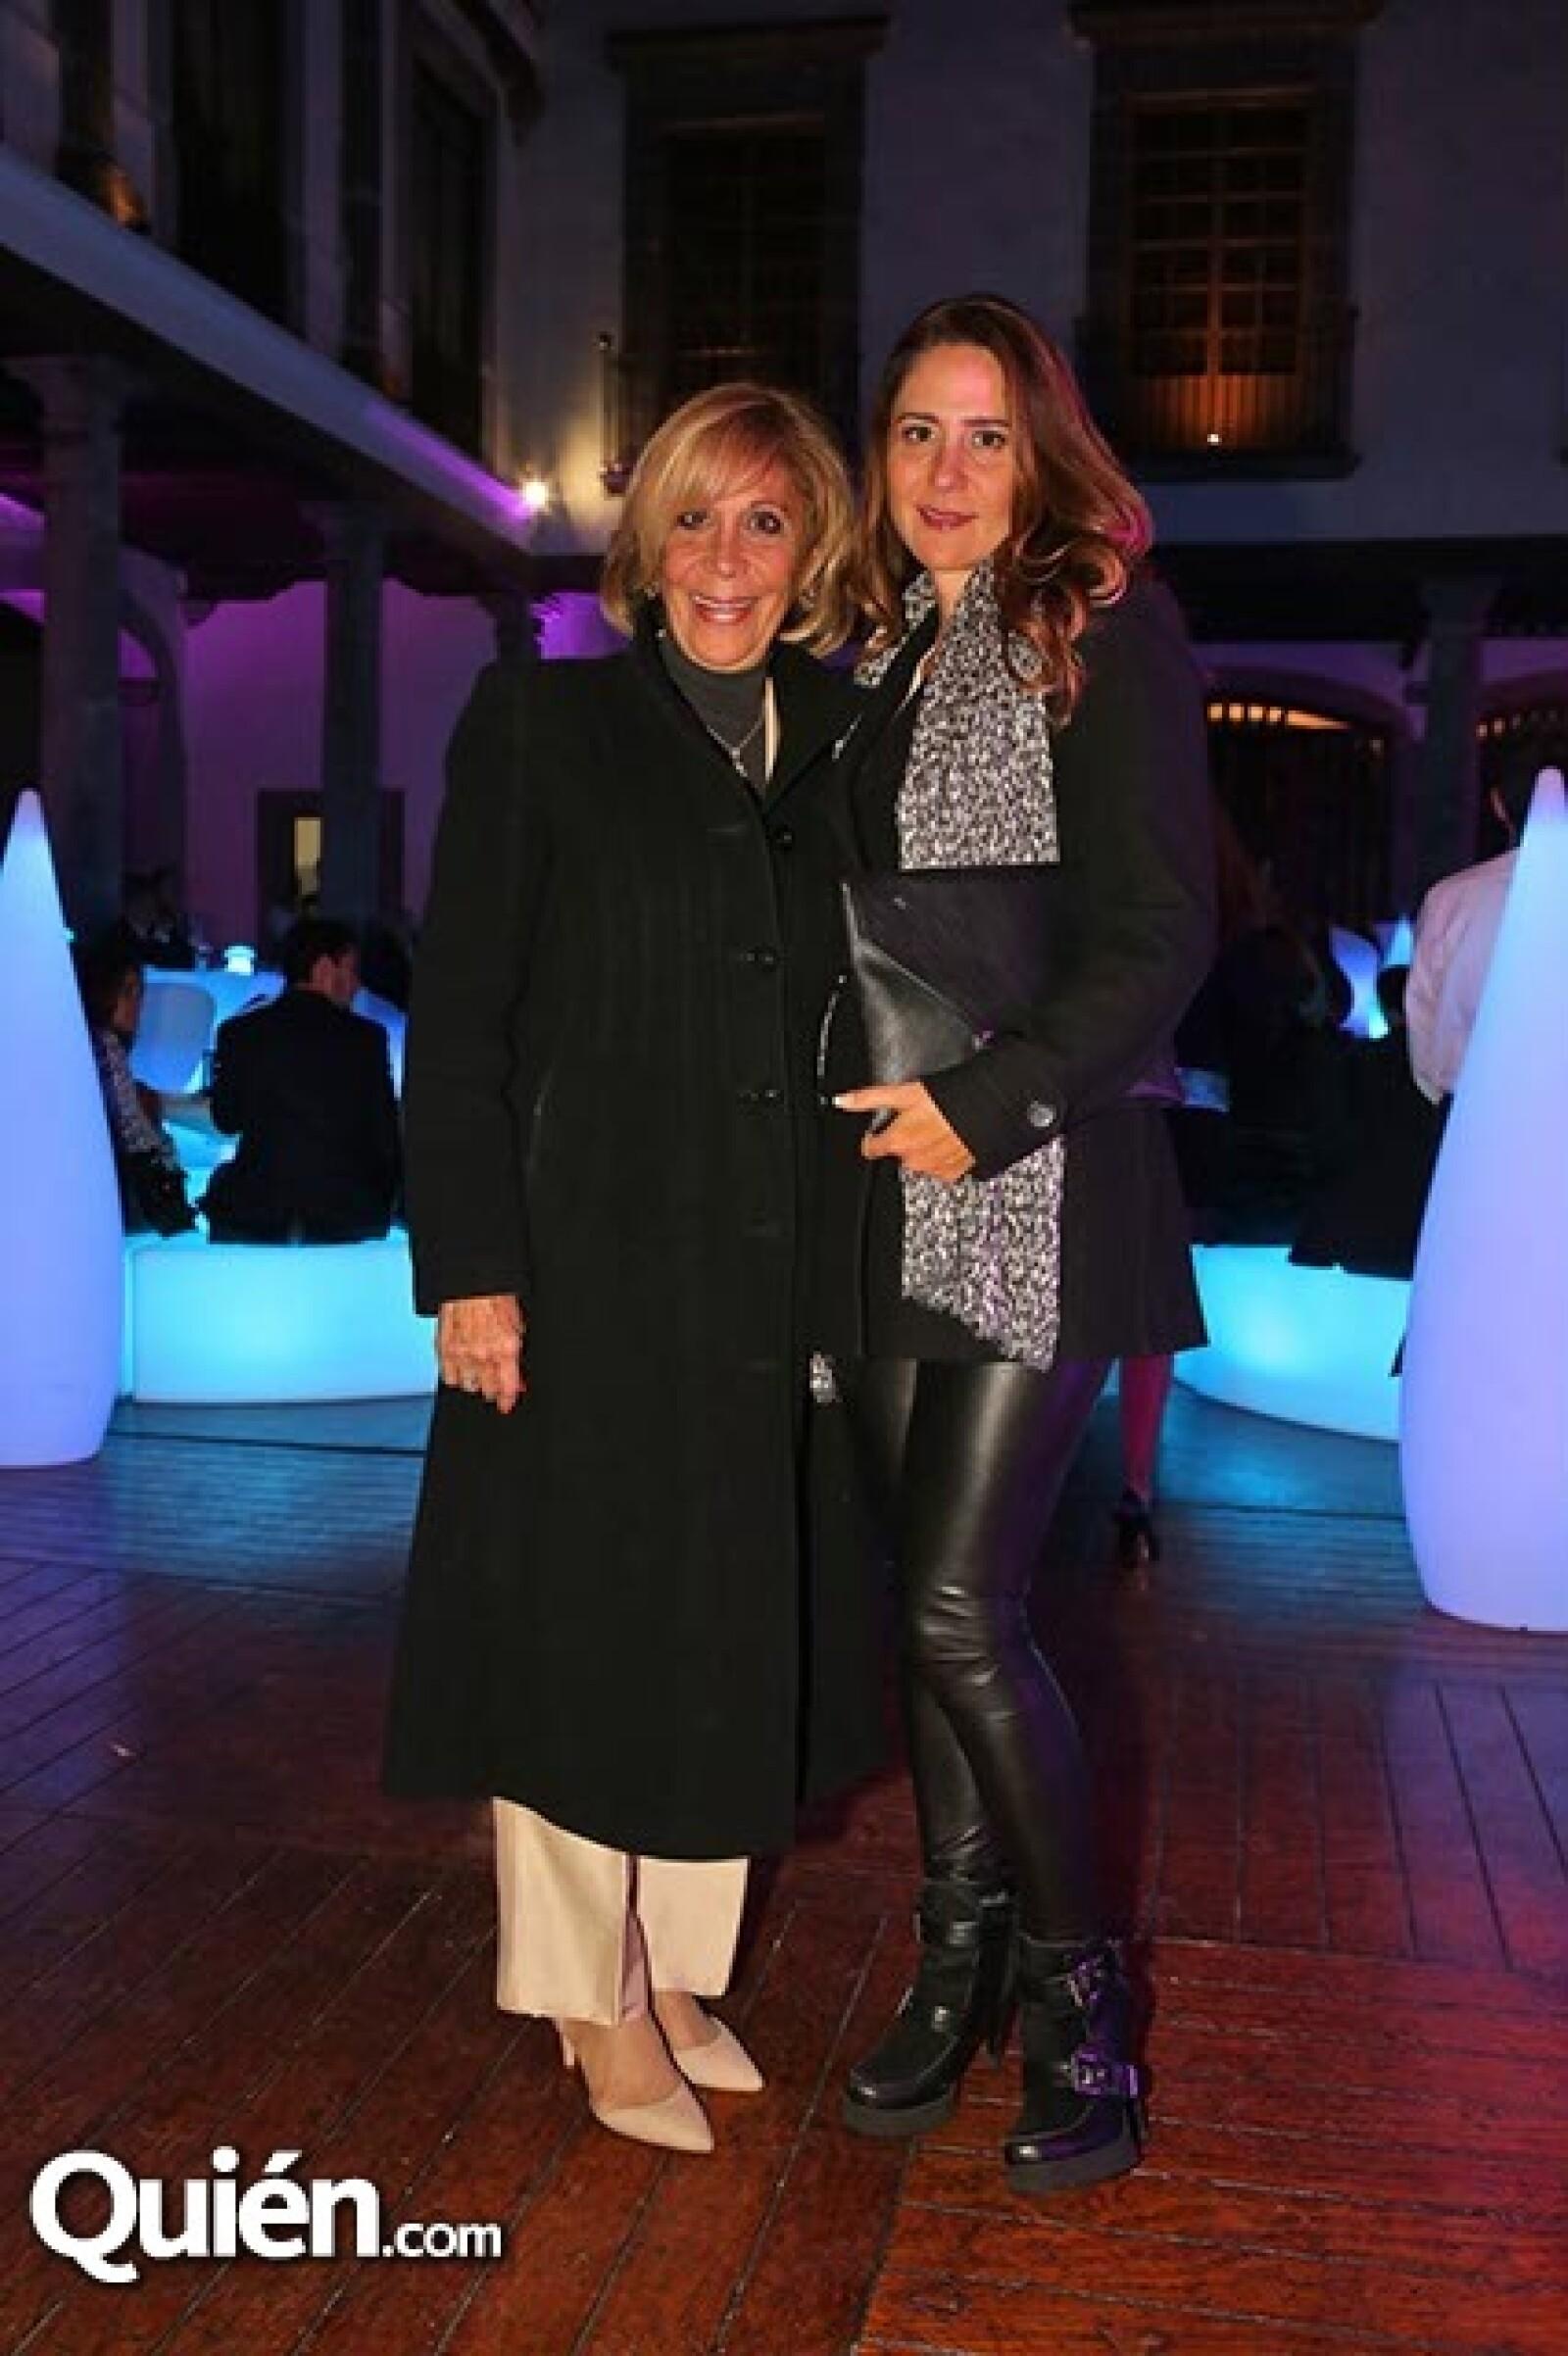 María Cristina Malpica y María Cristina González